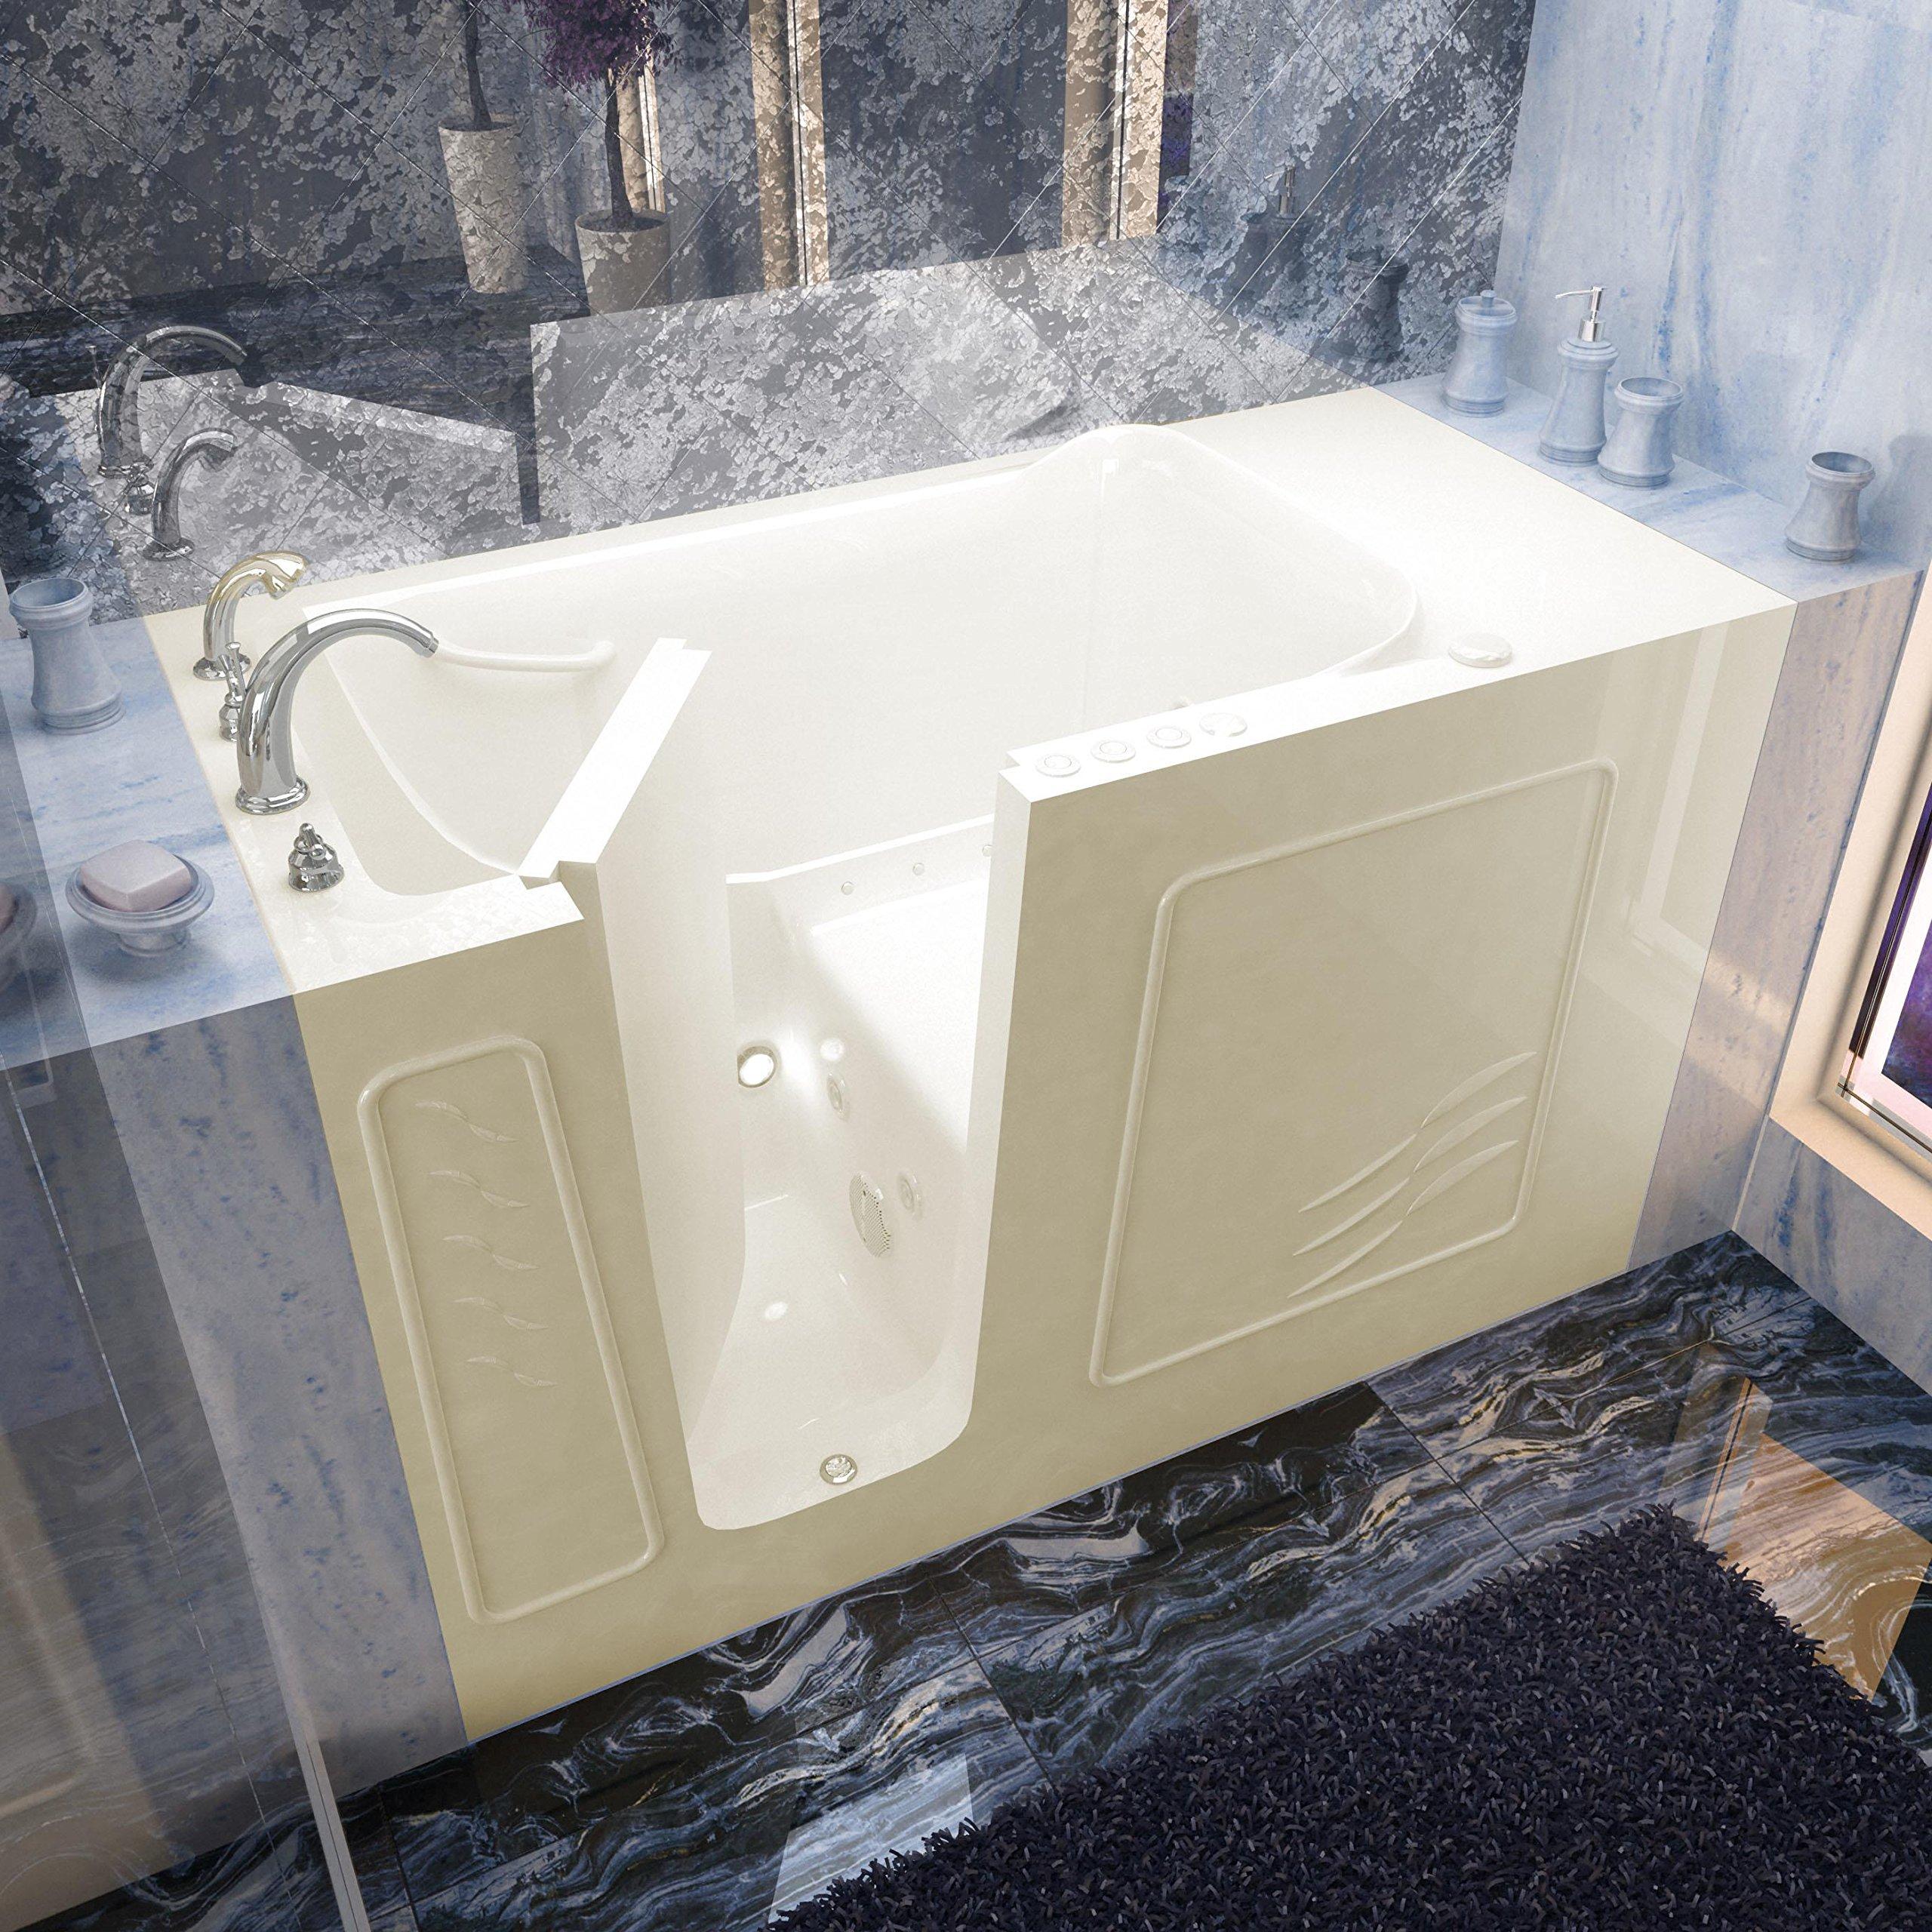 Spa World Venzi Vz3060wilbd Rectangular Air & Whirlpool Walk-In Bathtub, 30x60, Left Drain, Biscuit